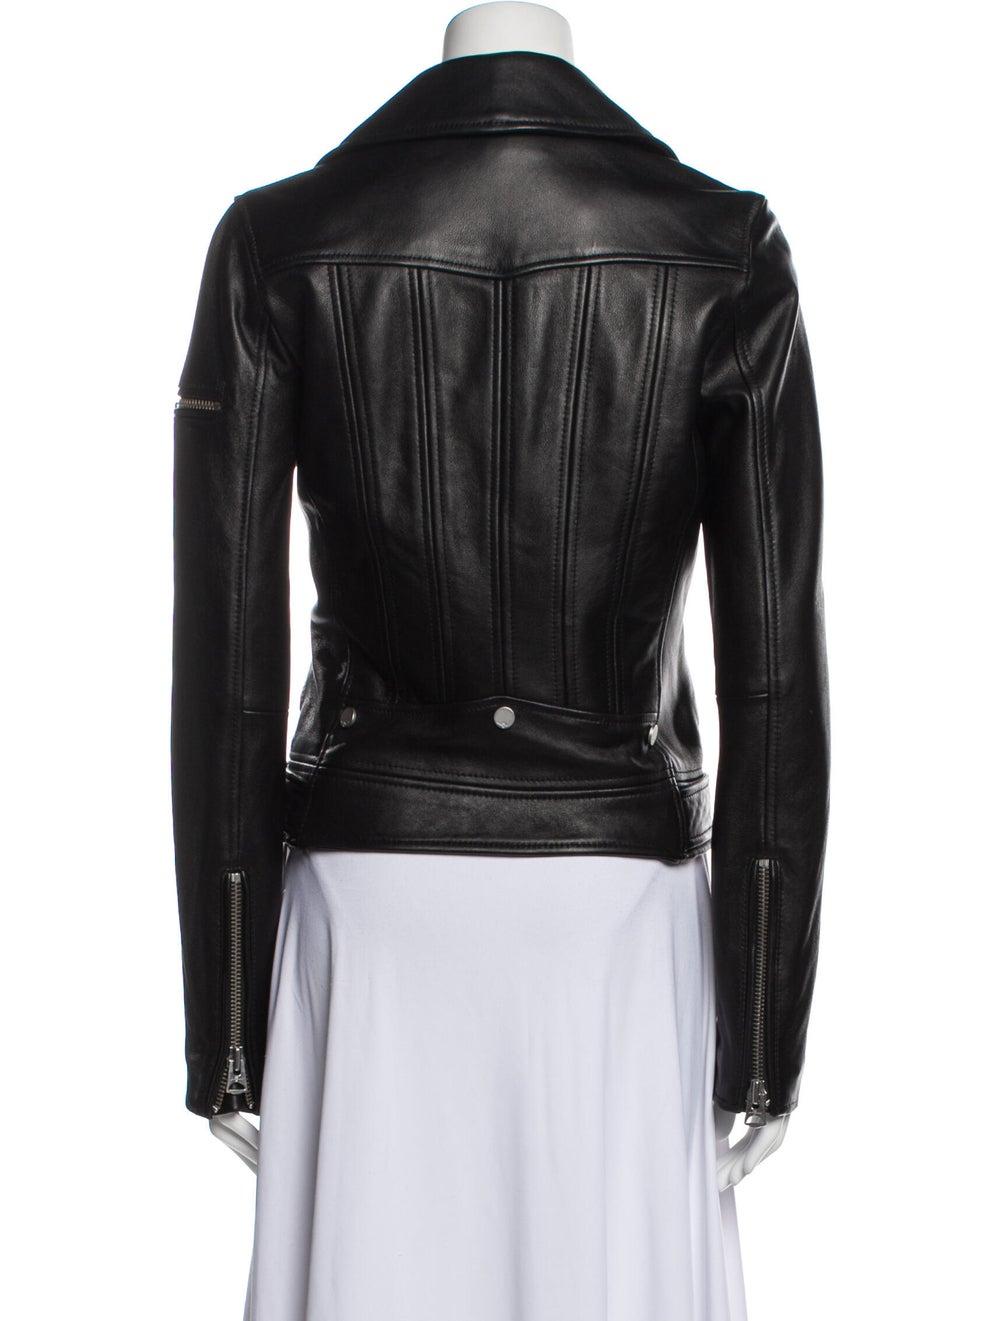 Jacket Leather Biker Jacket Black - image 3